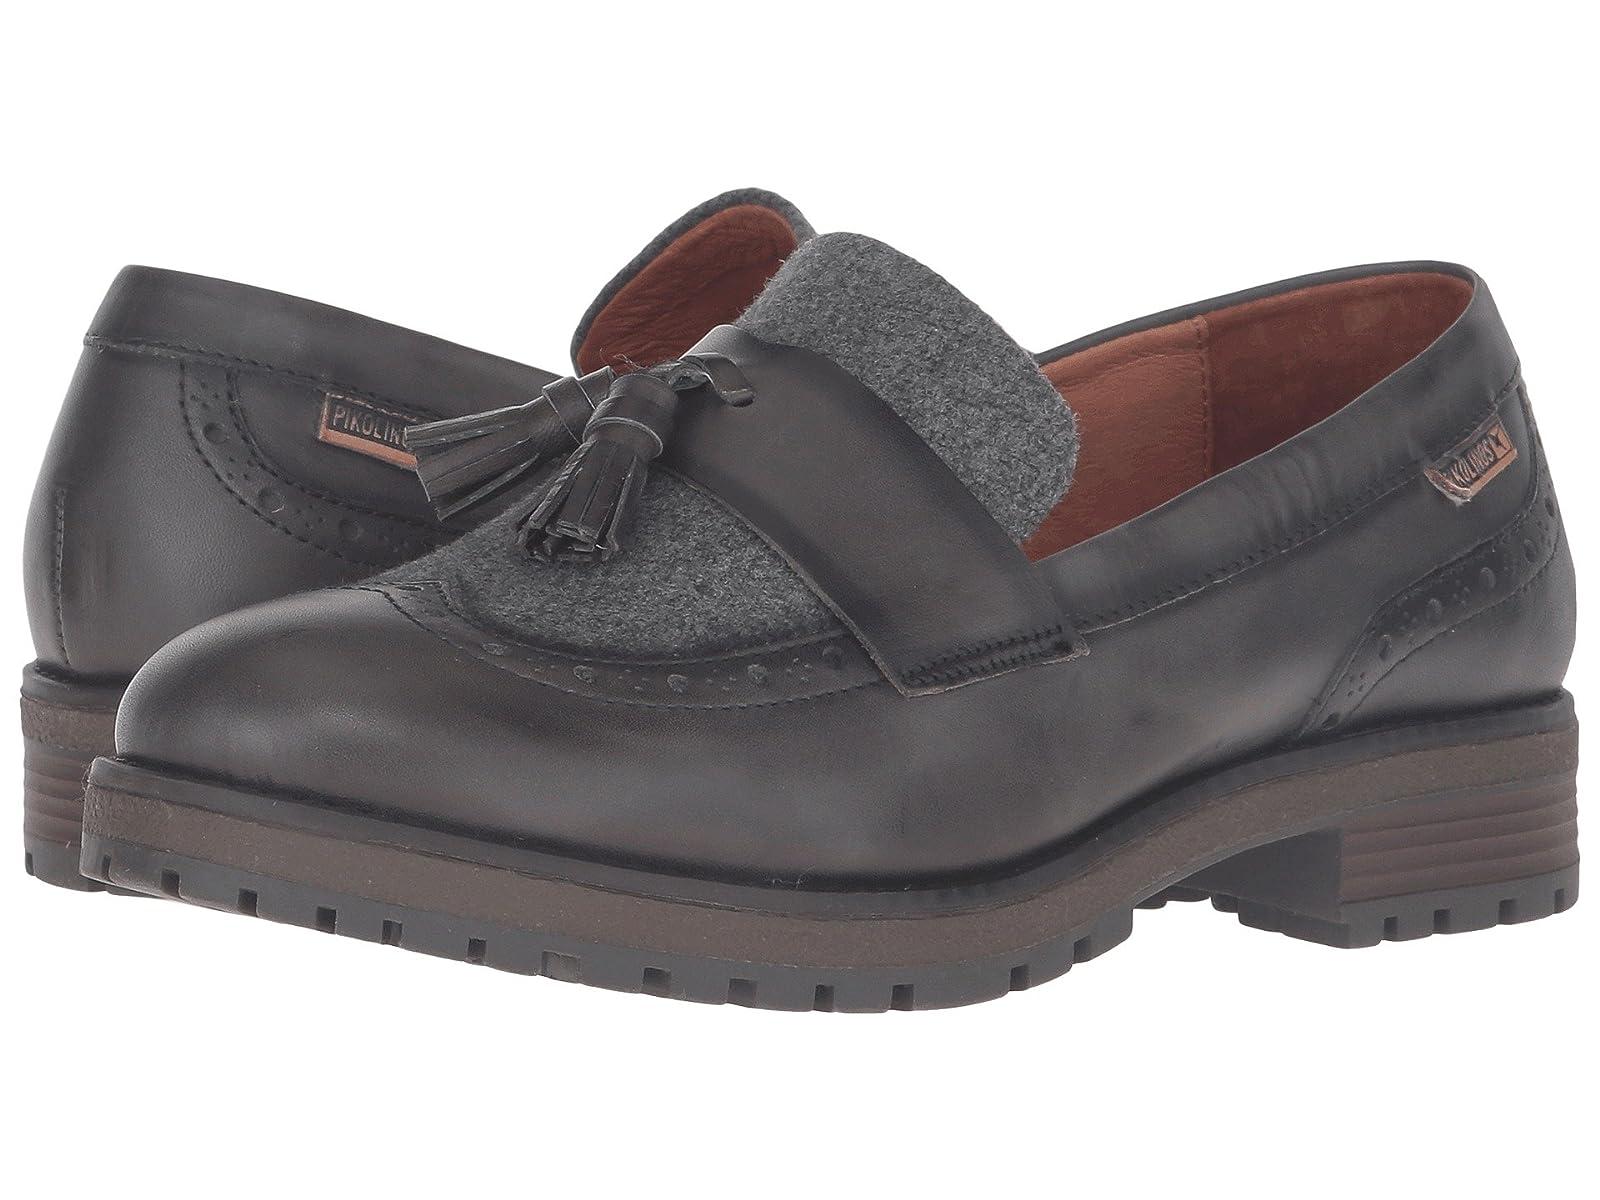 Pikolinos Santander W4J-3602C1Cheap and distinctive eye-catching shoes